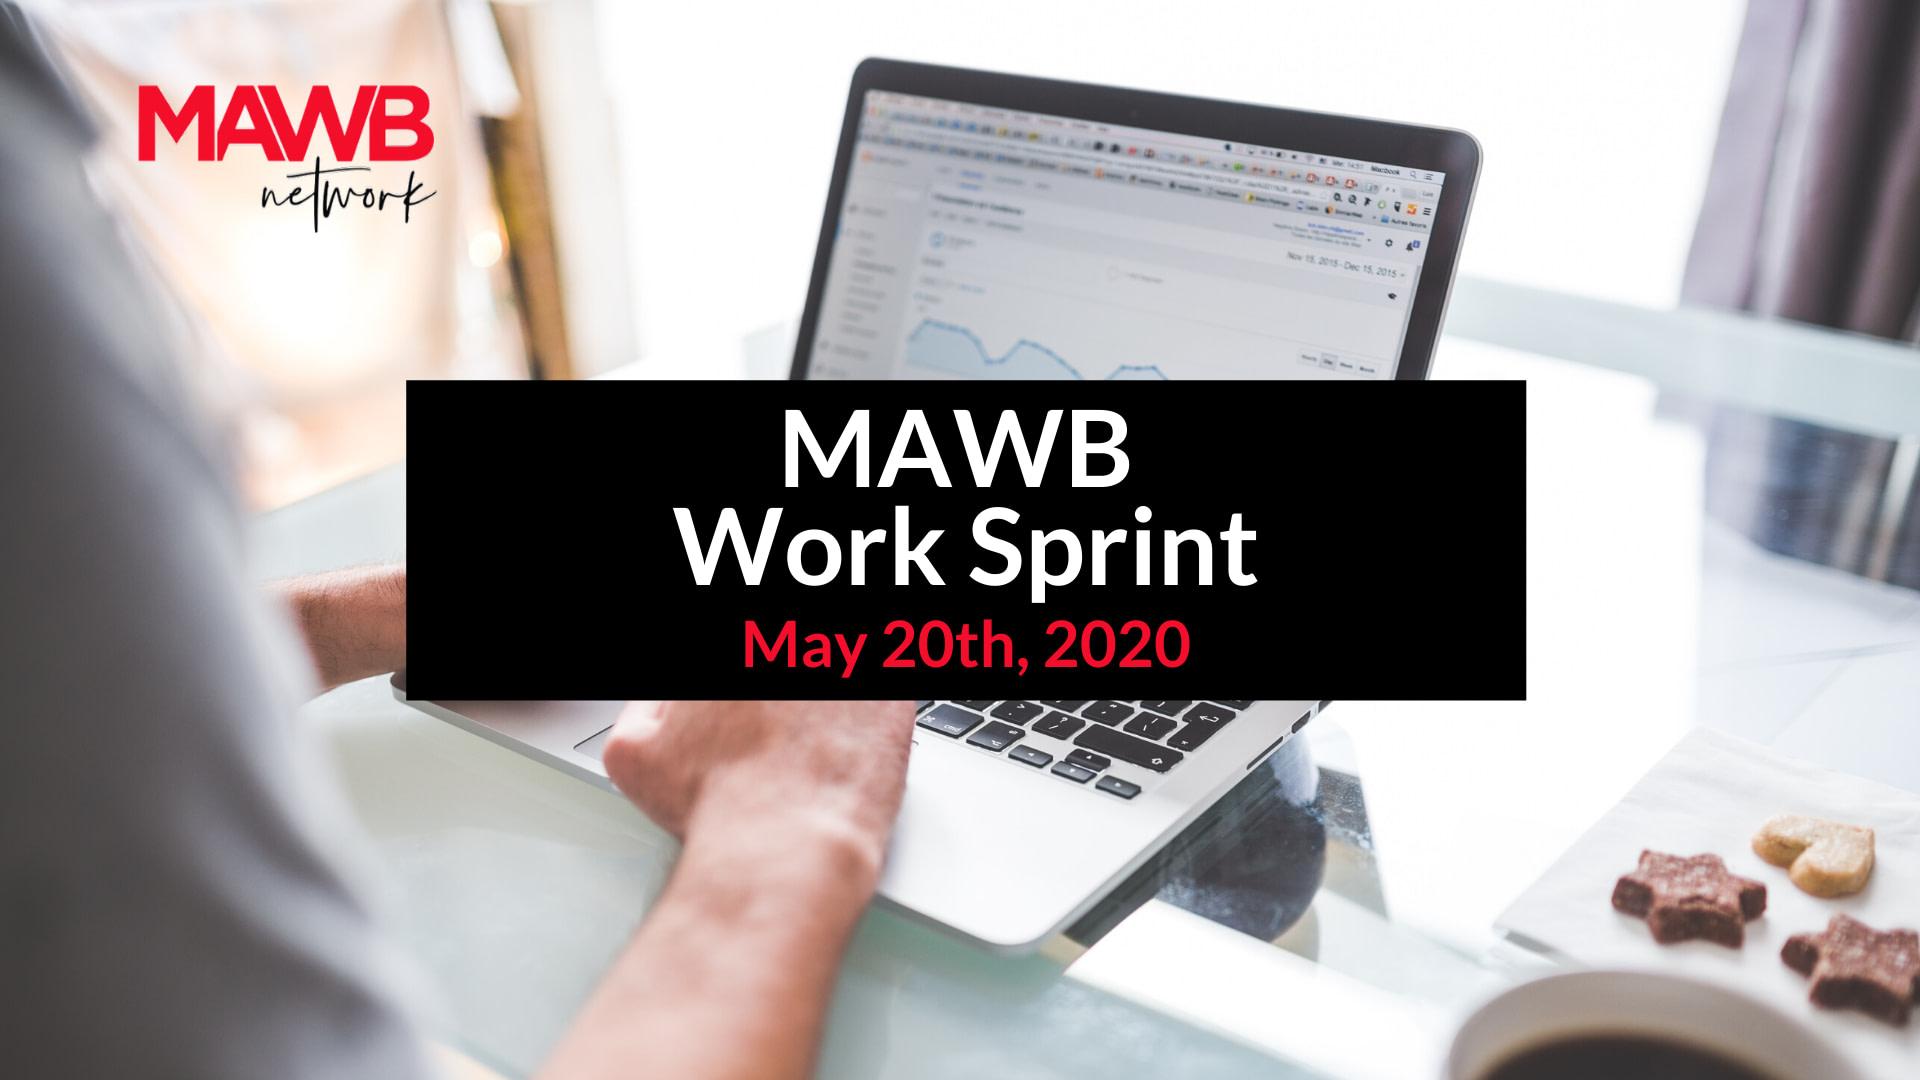 MAWB Work Sprint - May 20th, 2020